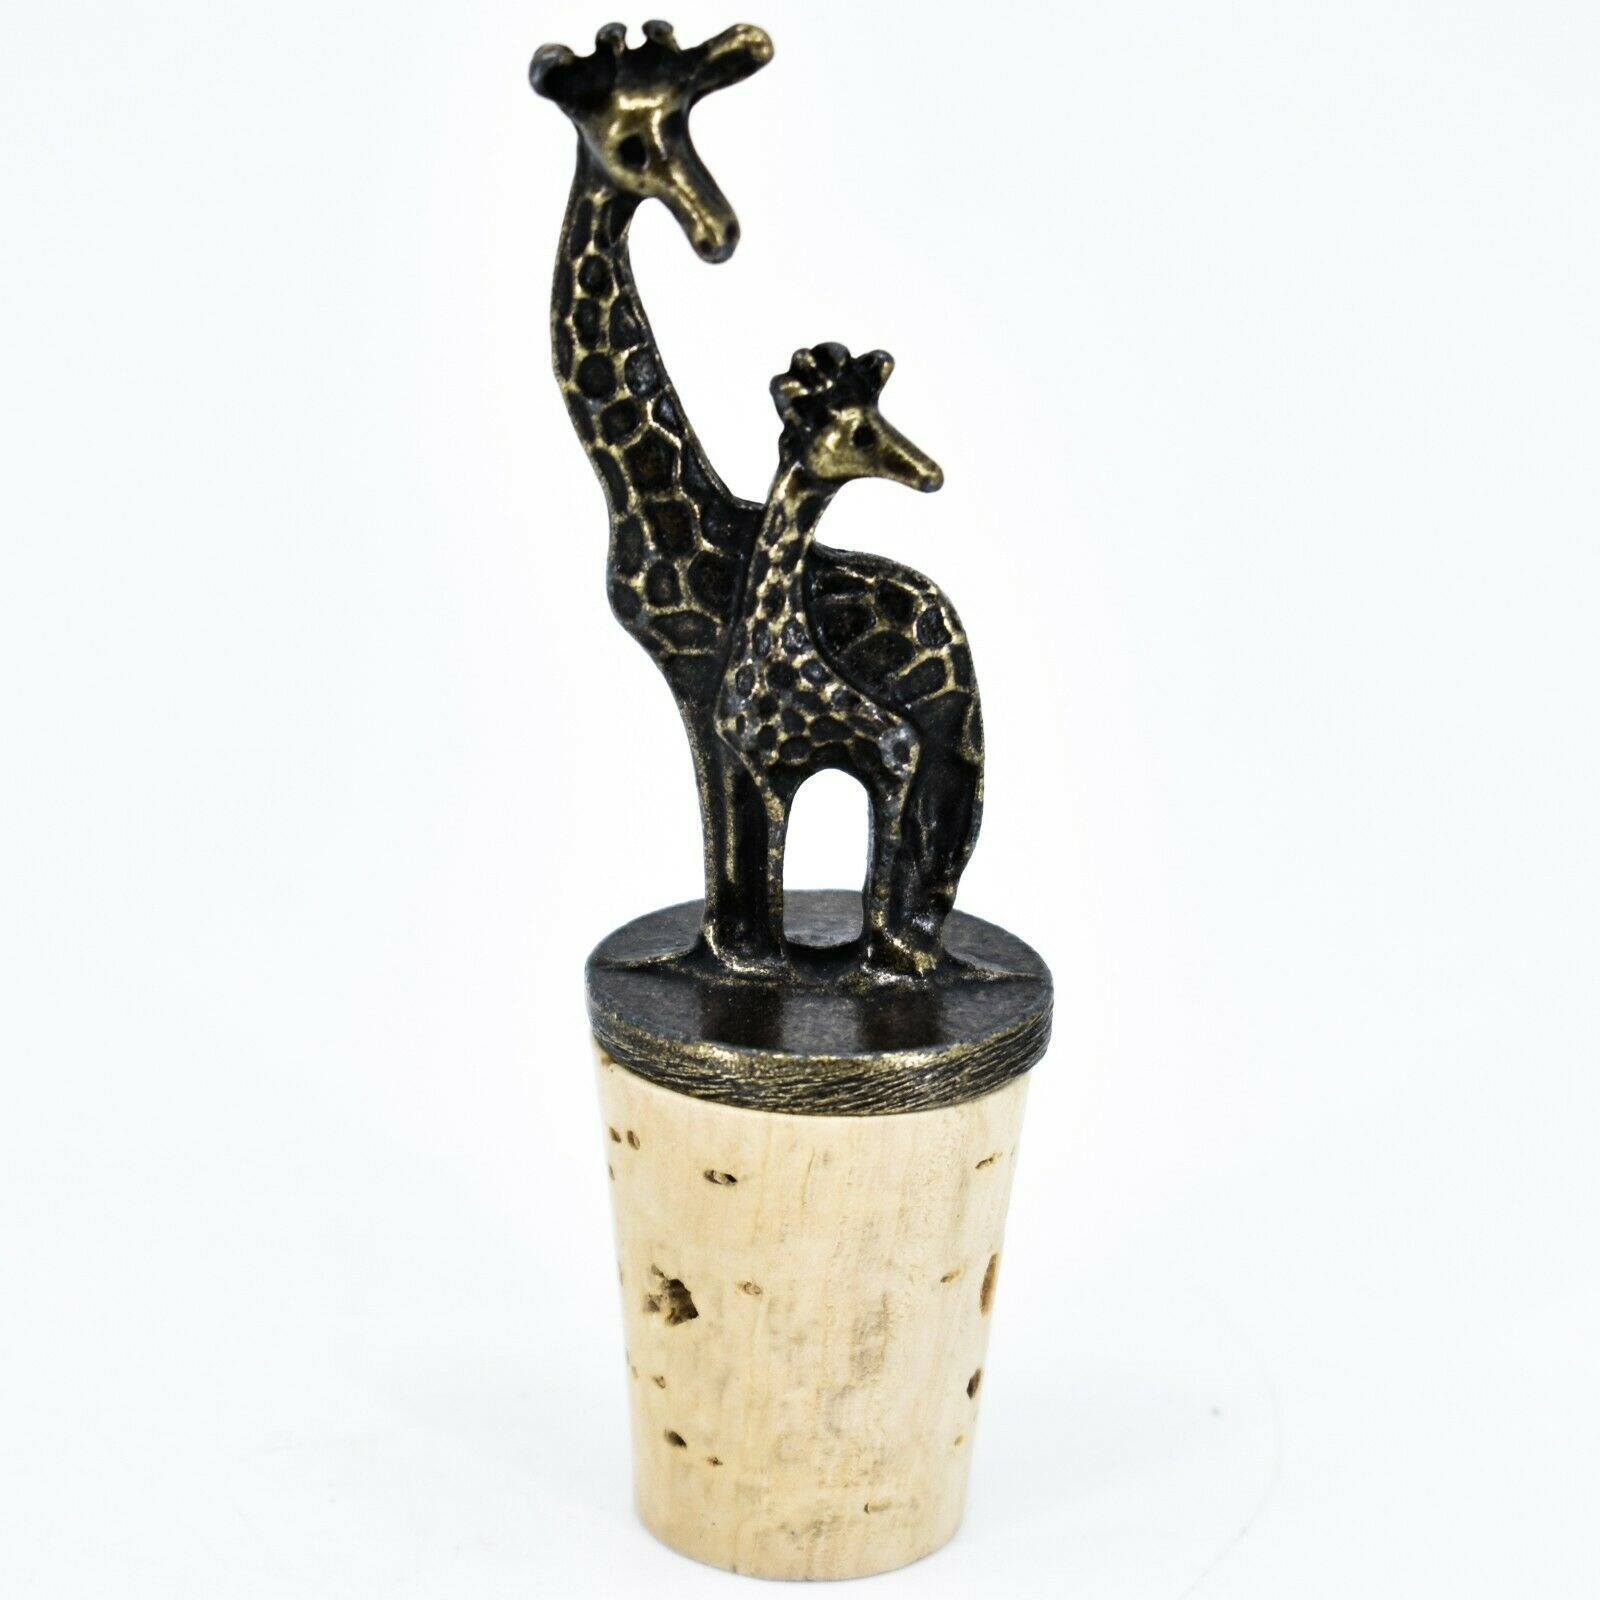 South African Cast Metal Antique Brass Finish Giraffes Wine Bottle Cork Stopper